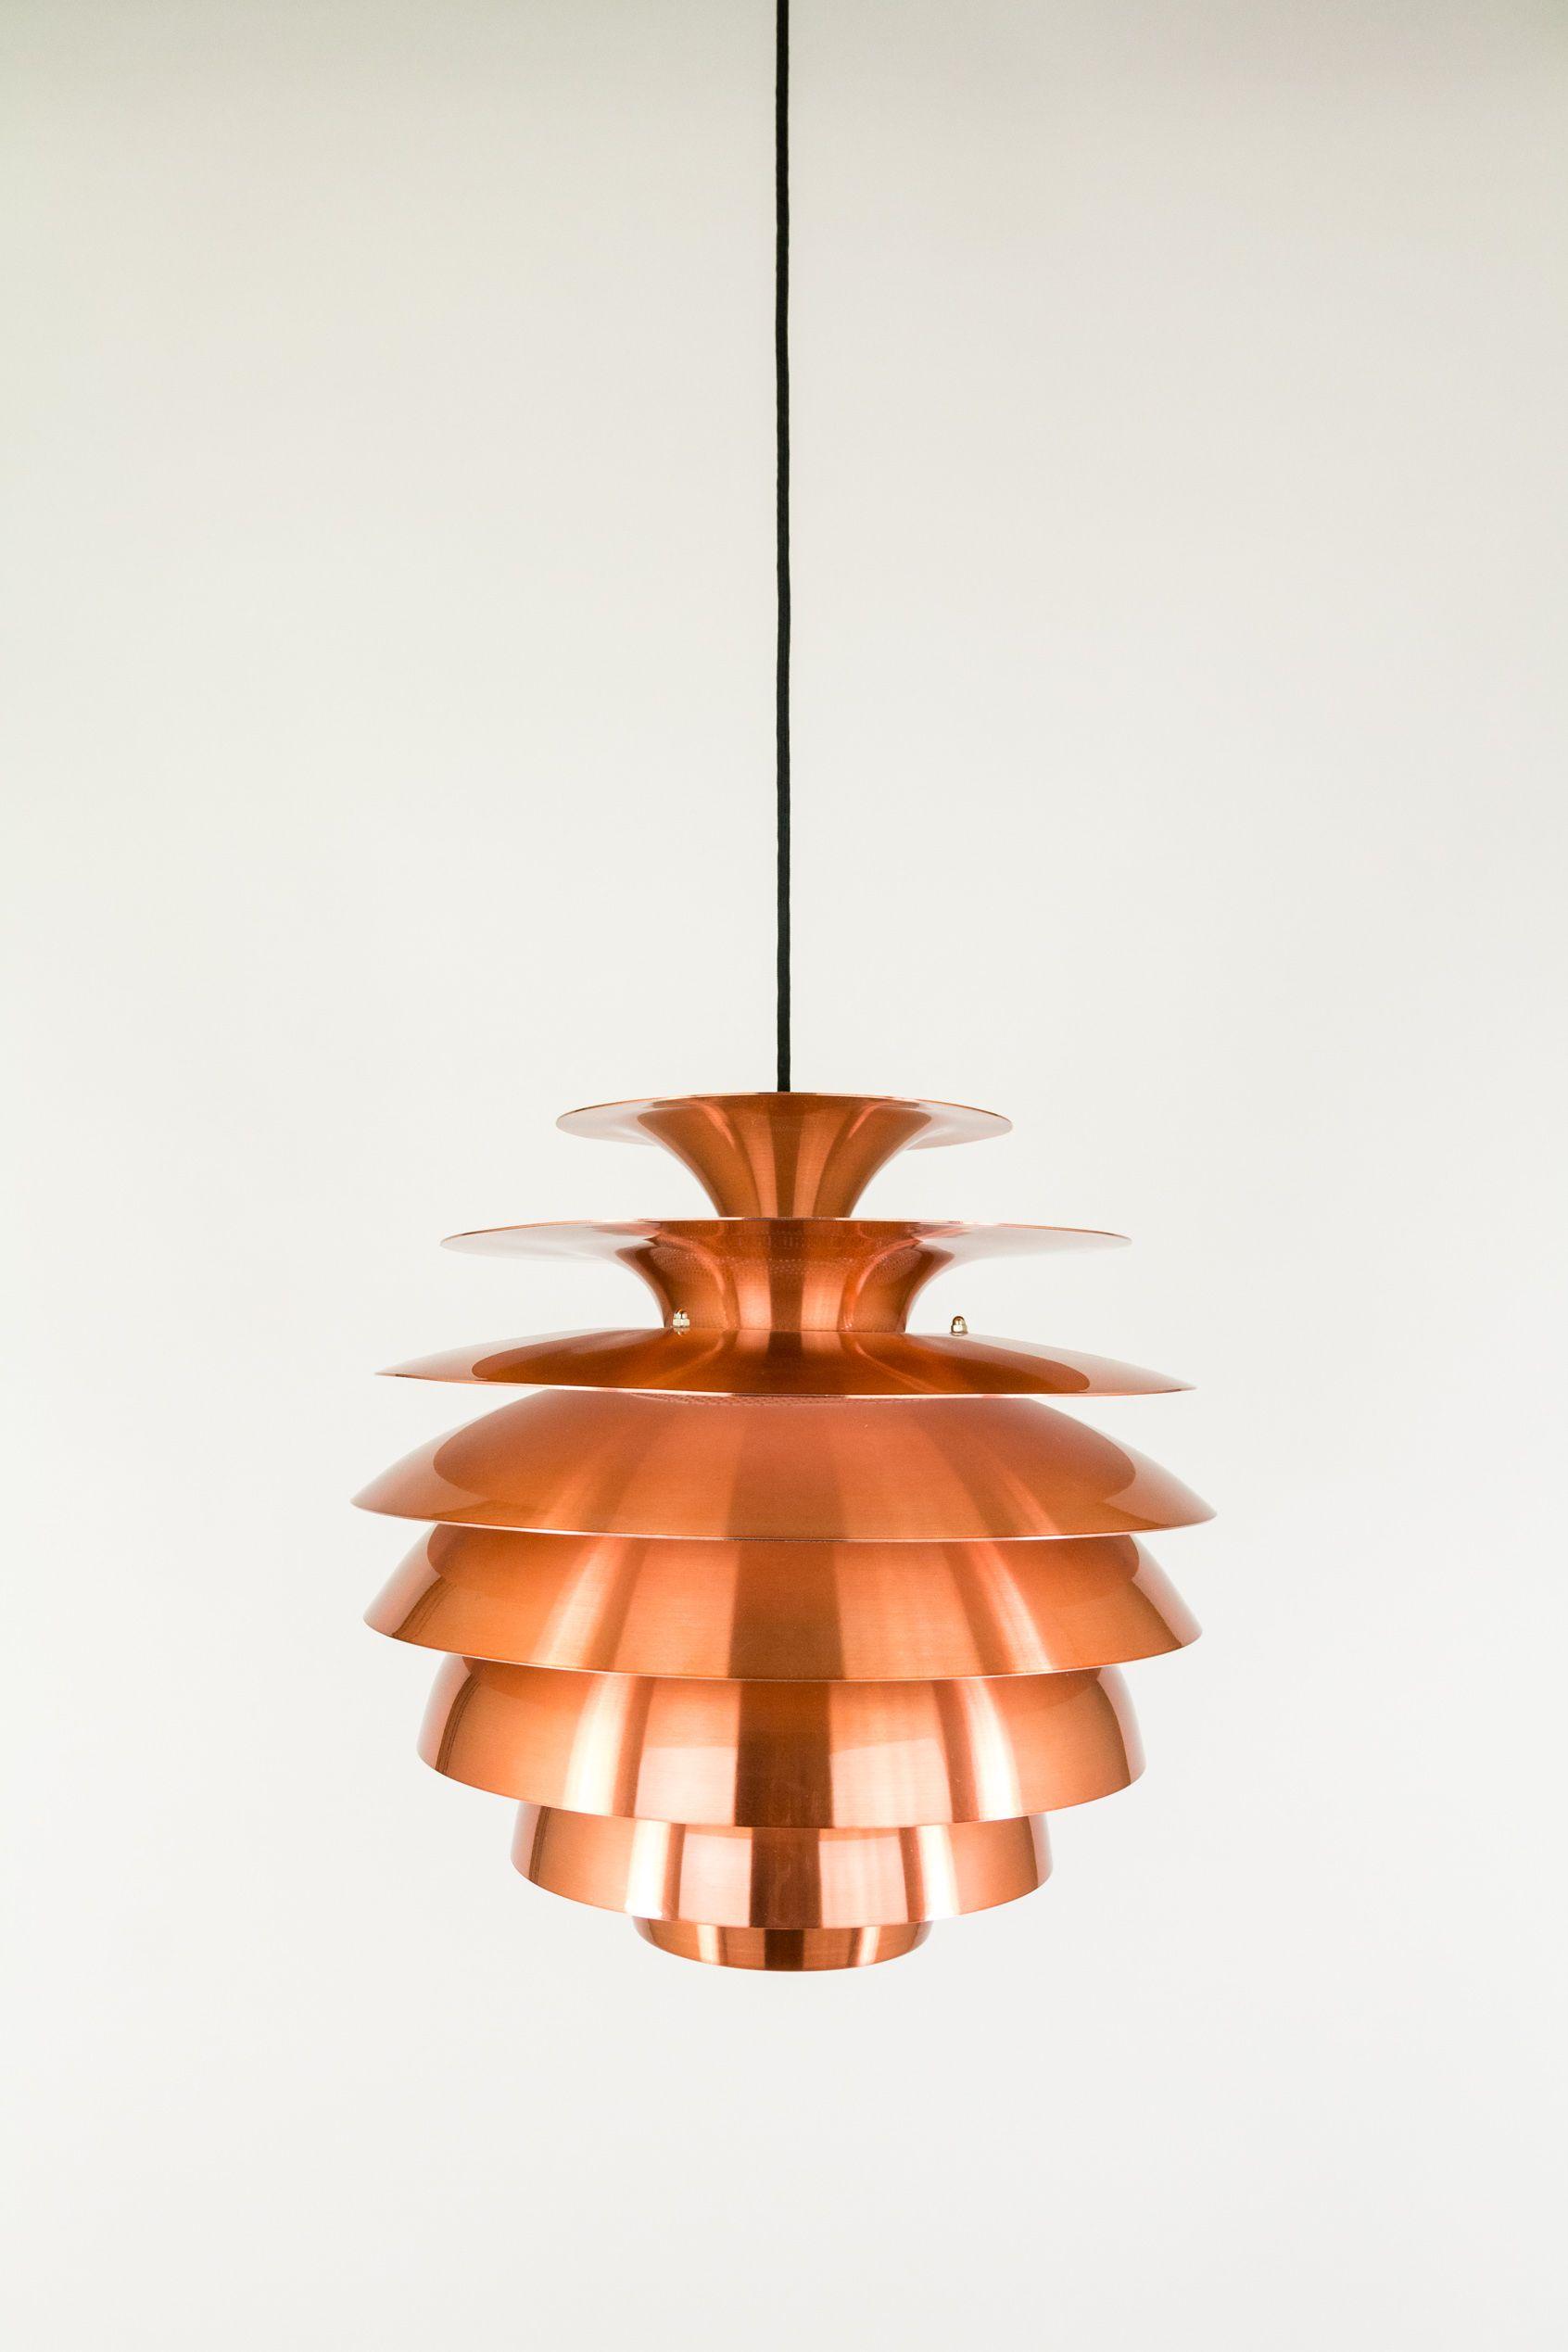 Copper Barcelona Pendant Manufactured By Danish Lighting